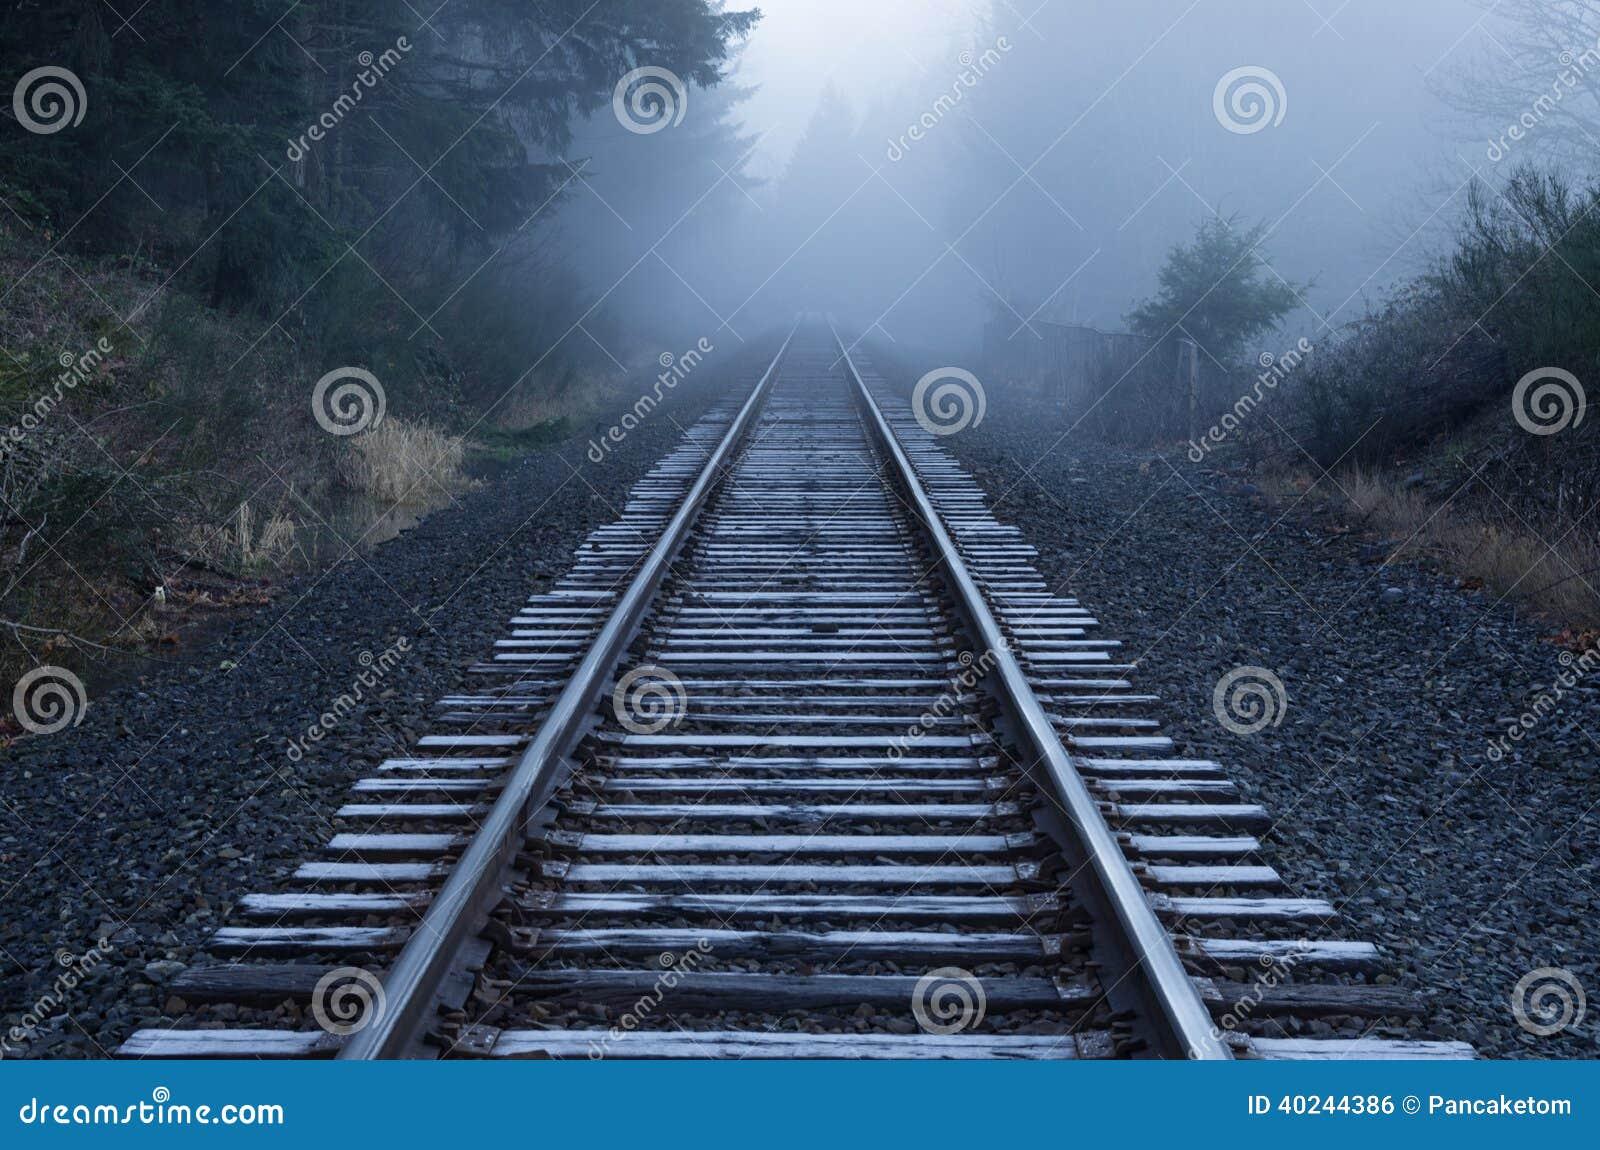 Foggy Railroad Tracks